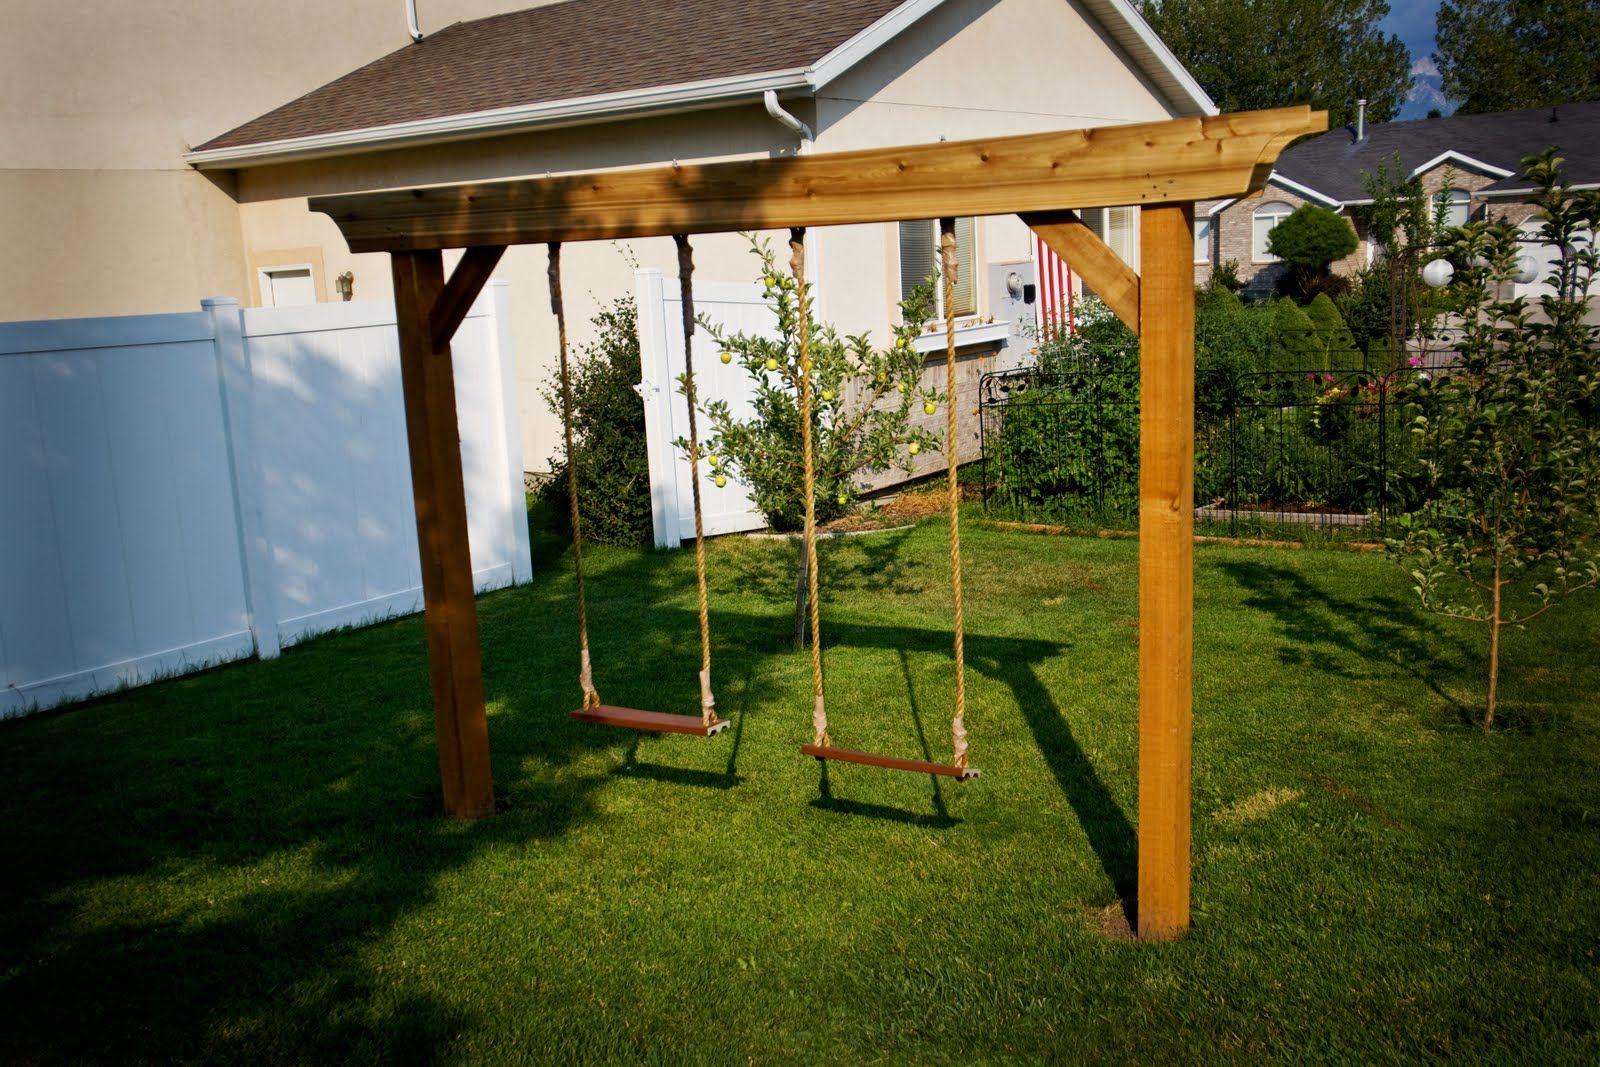 Pergola Swing Set Plans Pdf Woodworking Play Area Backyard